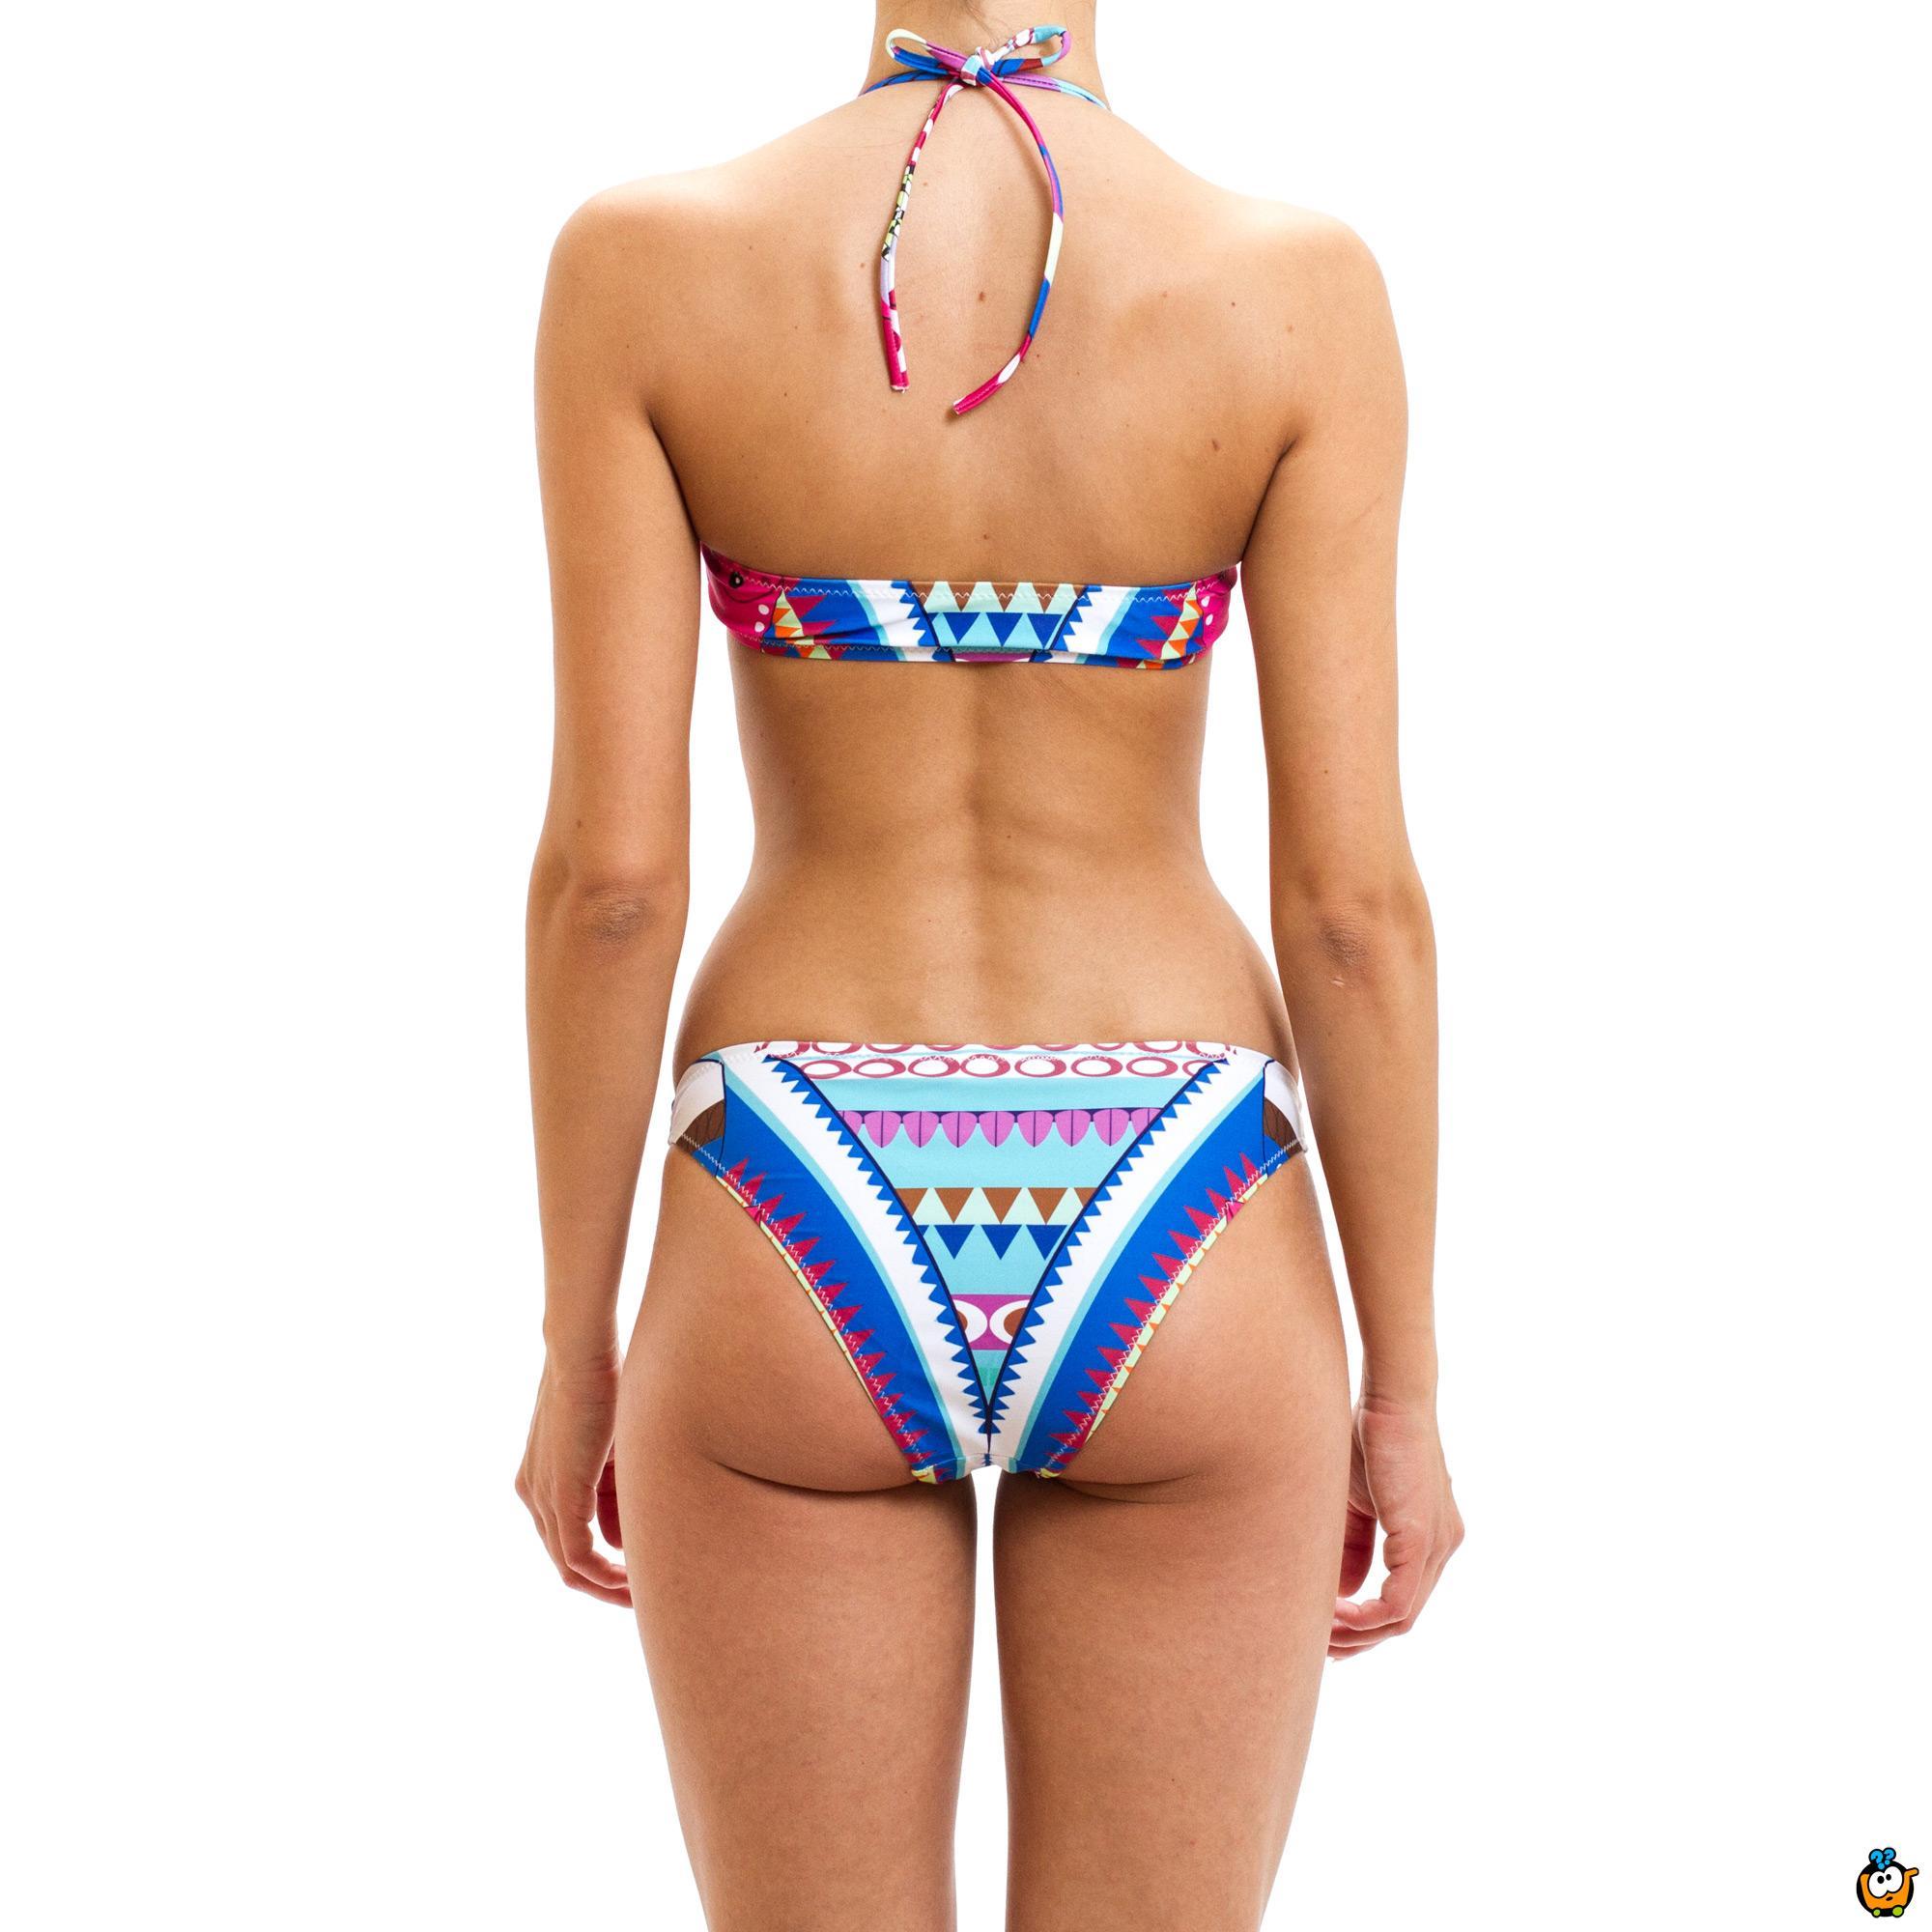 Dvodelni ženski kupaći kostim - SUMMER RIO